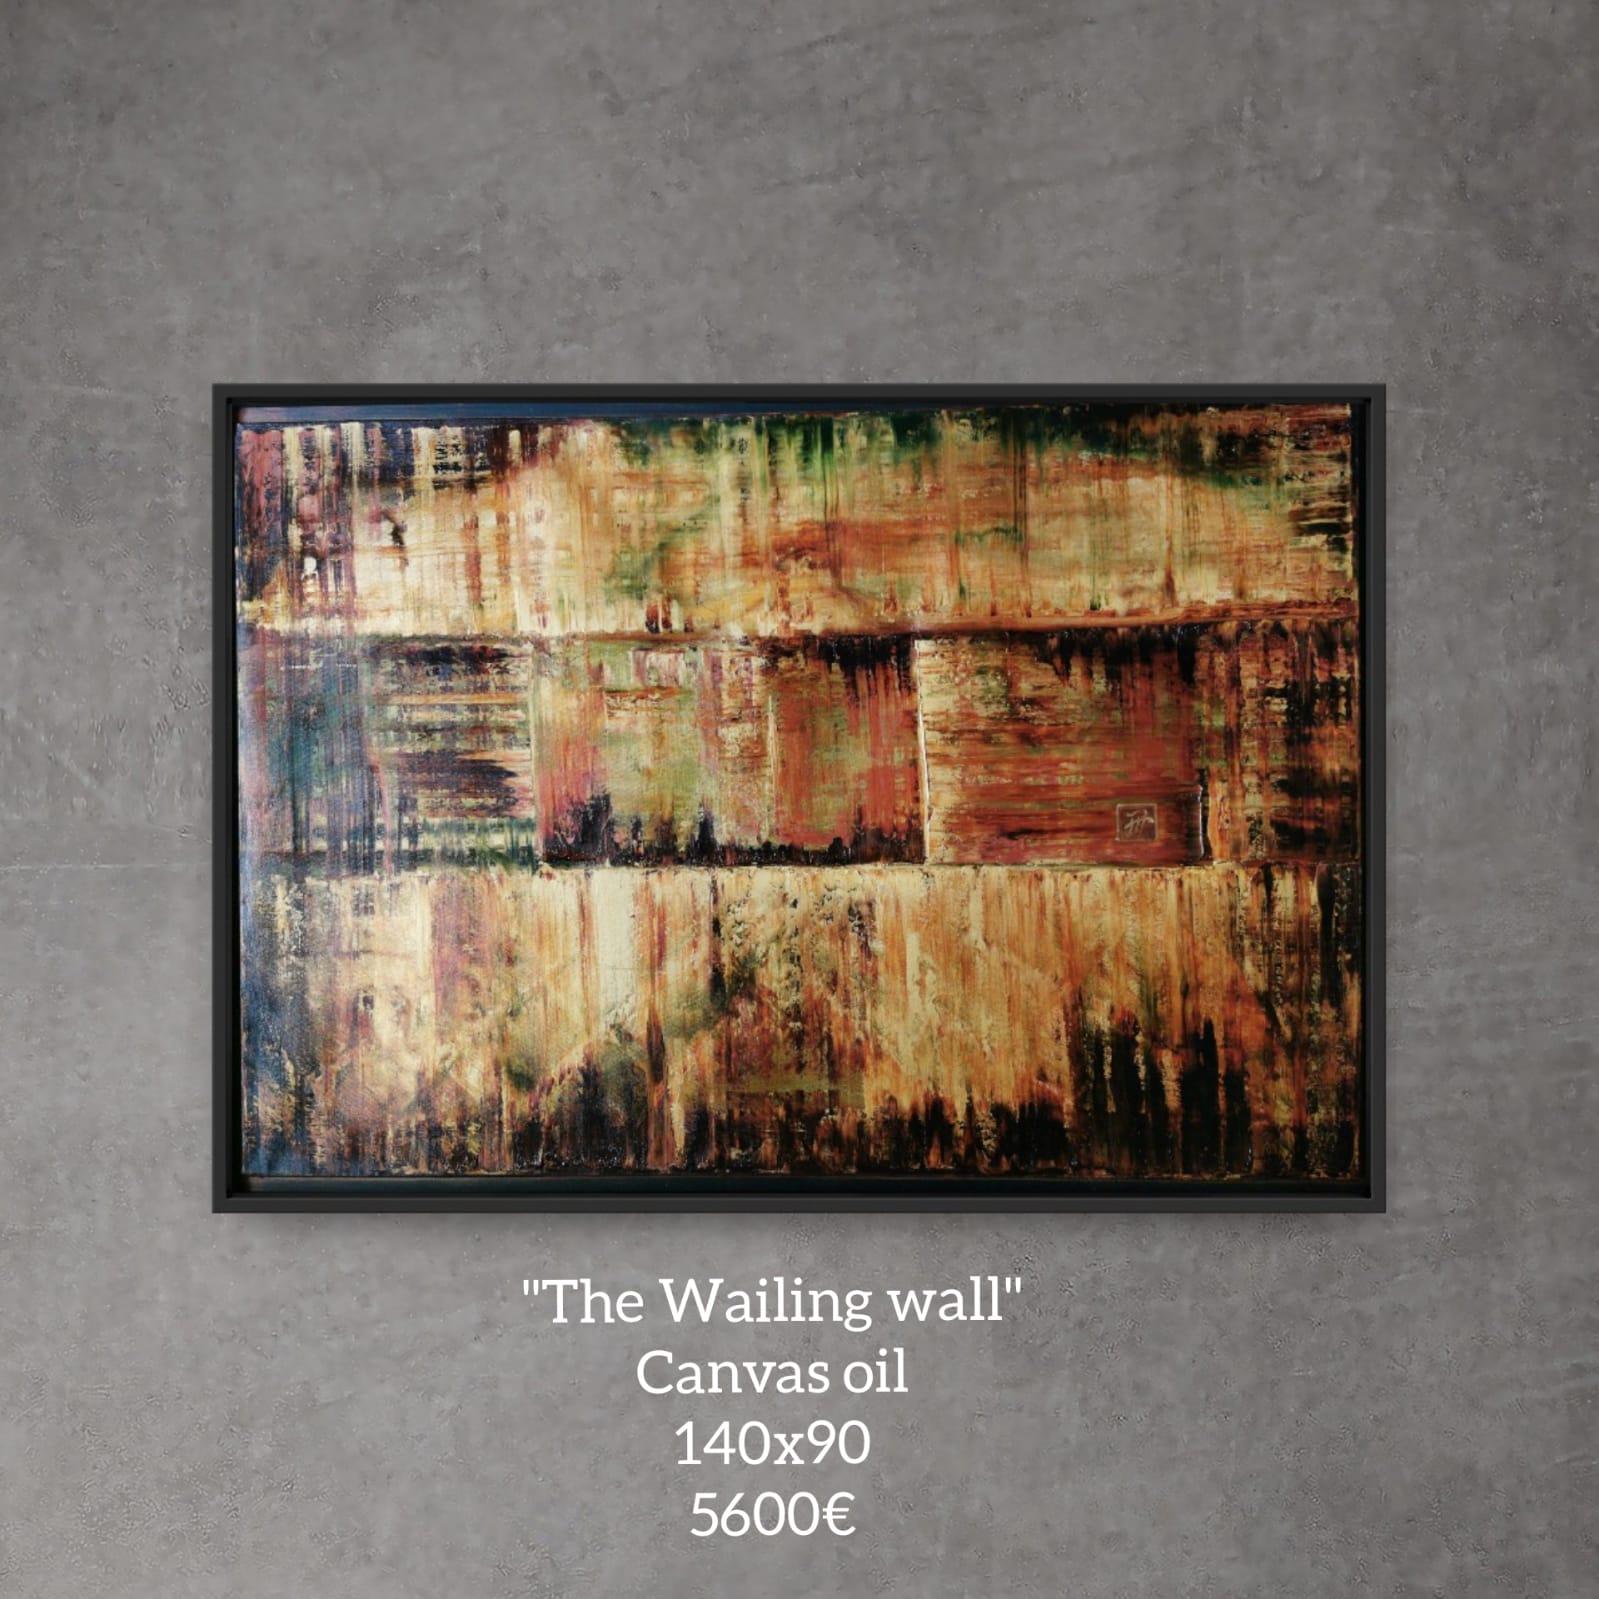 The Wailing Wall Painting